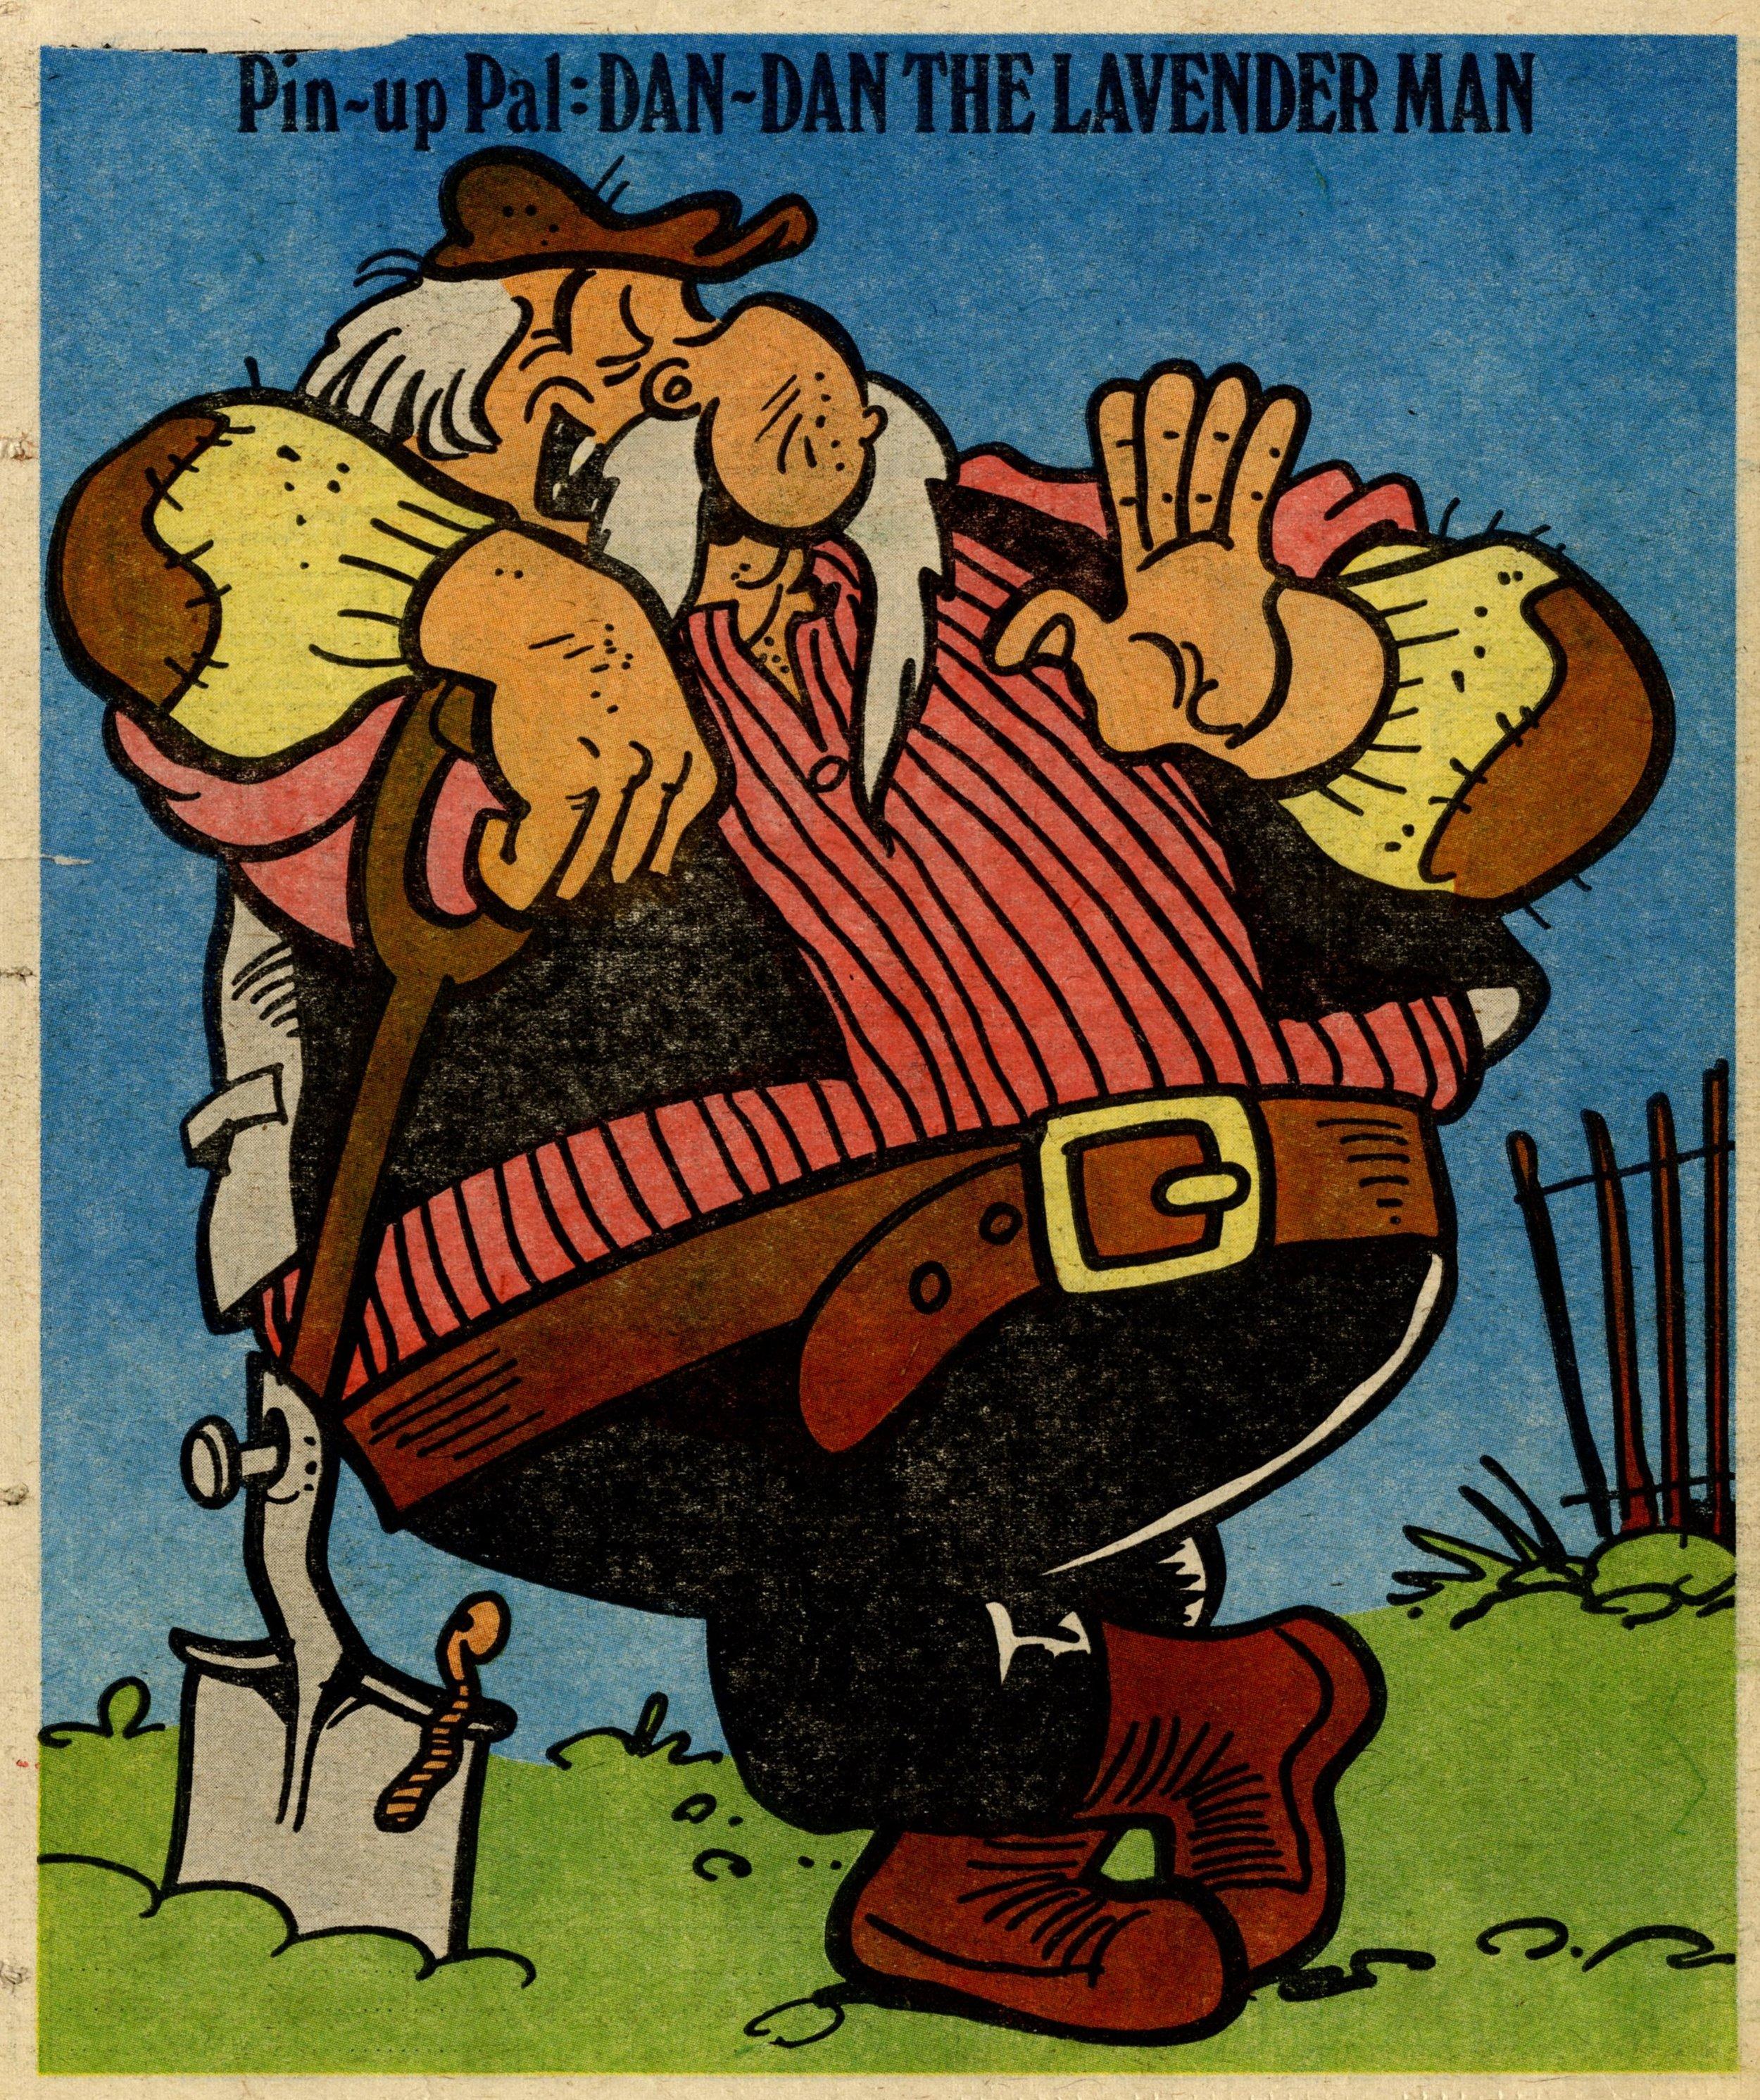 Pin-up Pal: Dan-Dan the Lavender Man (artist Frank McDiarmid), 3 March 1979